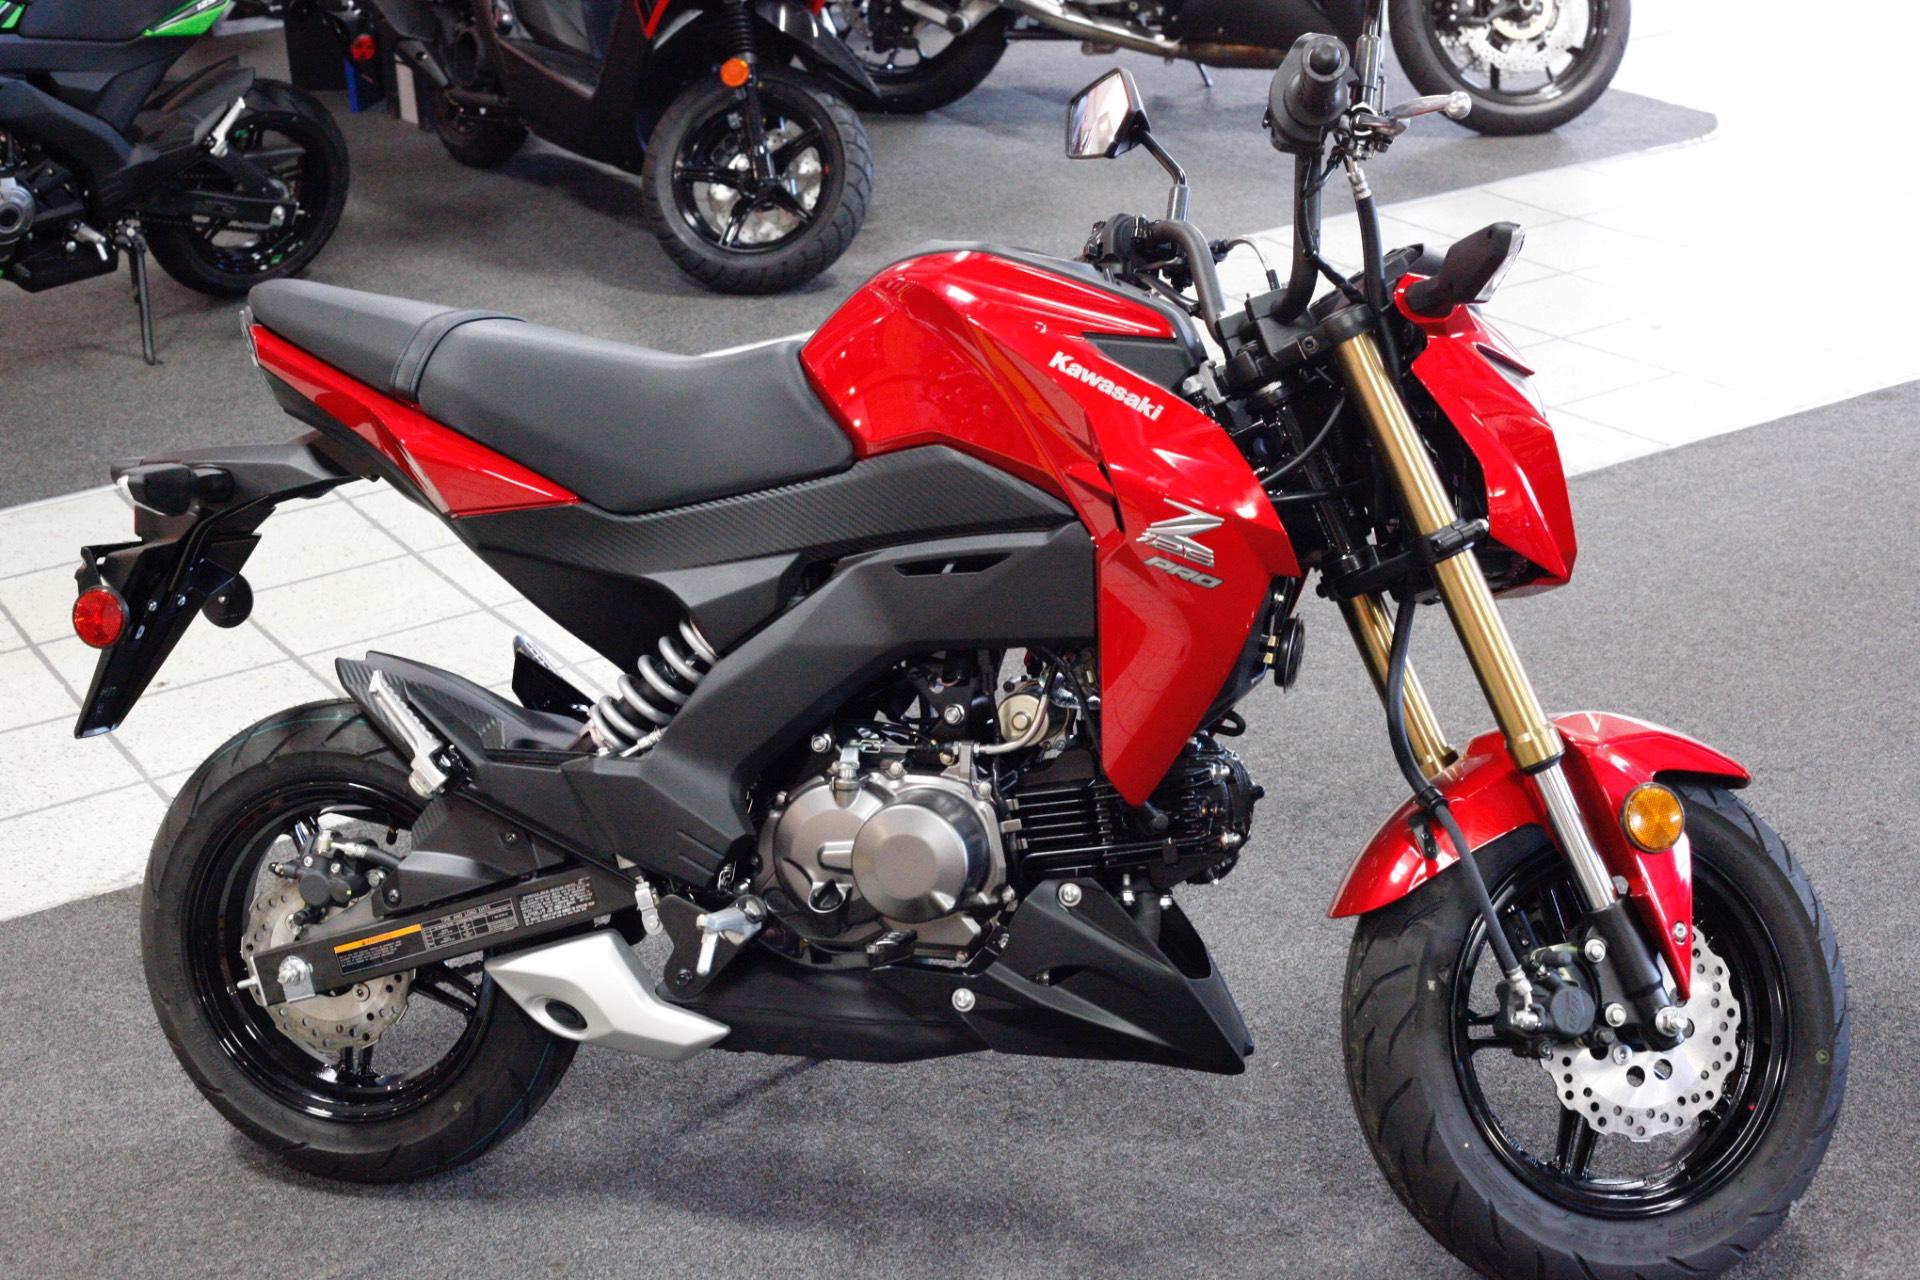 New 2018 Kawasaki Z125 Pro Motorcycles In Rock Falls Il